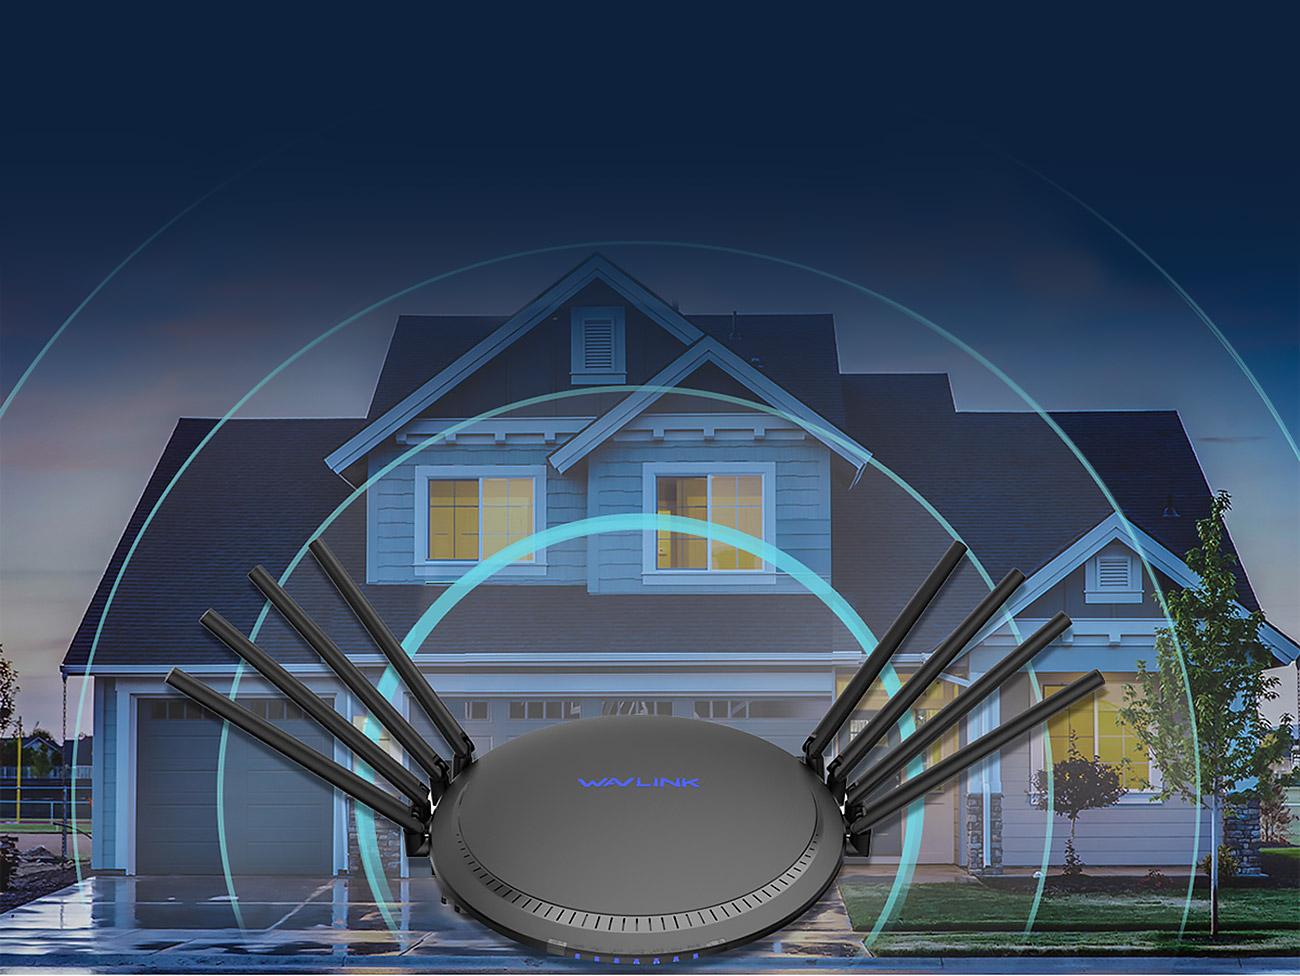 8 x 5dBi High Gain Antennas-Full Coverage